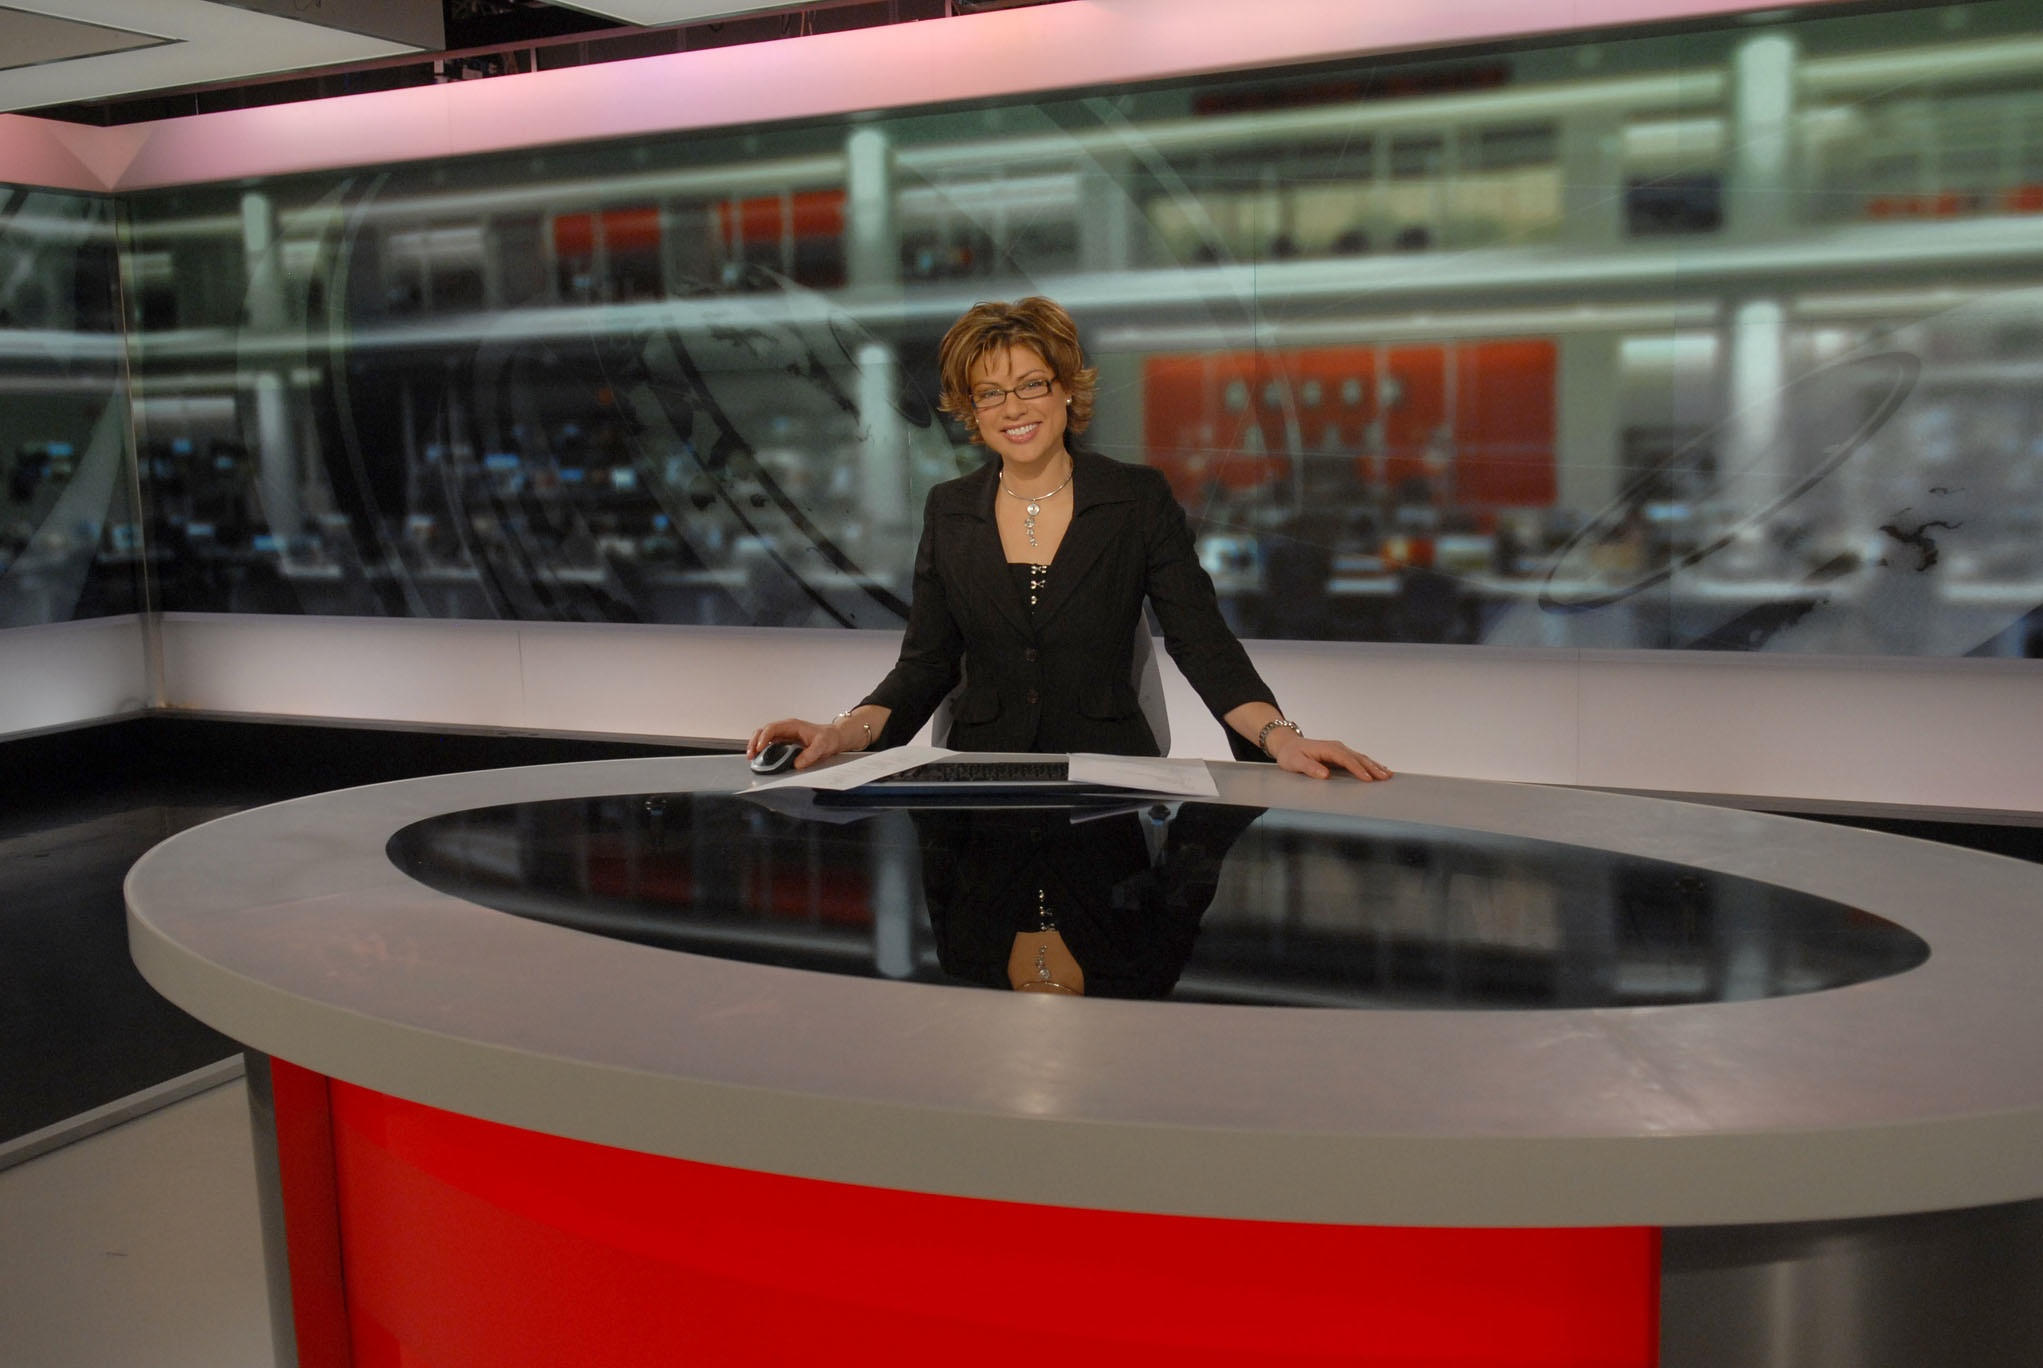 BBC News Photo: Patten Defends BBC News Output